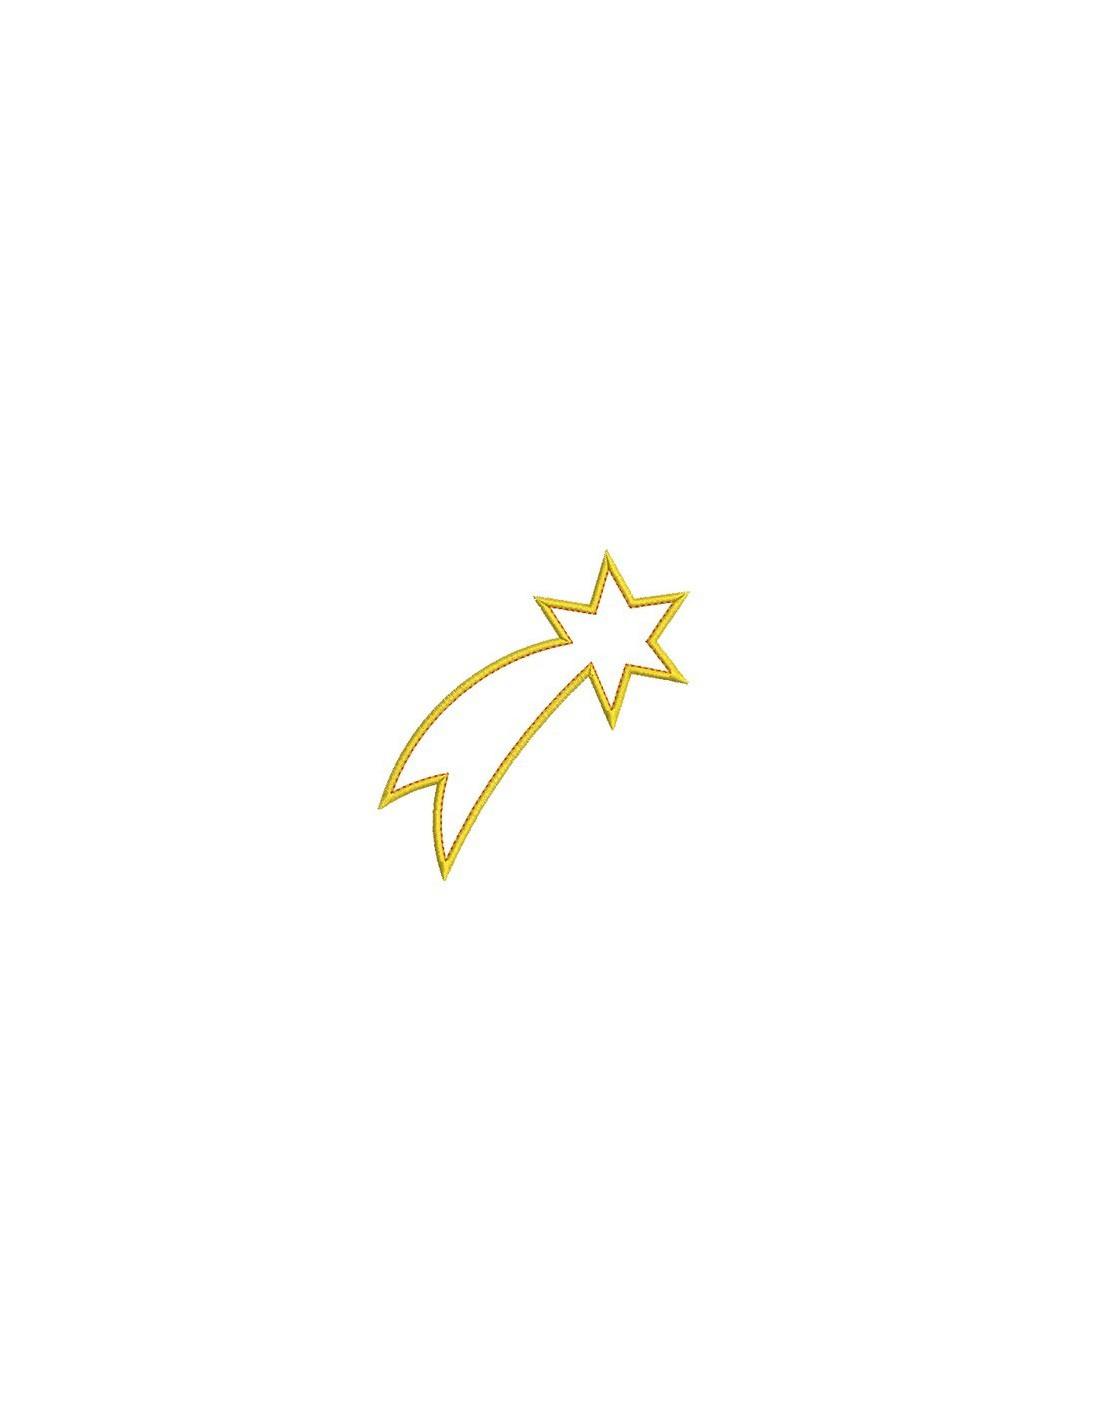 Modèle Et Motif étoile Filante Mittvidimerga